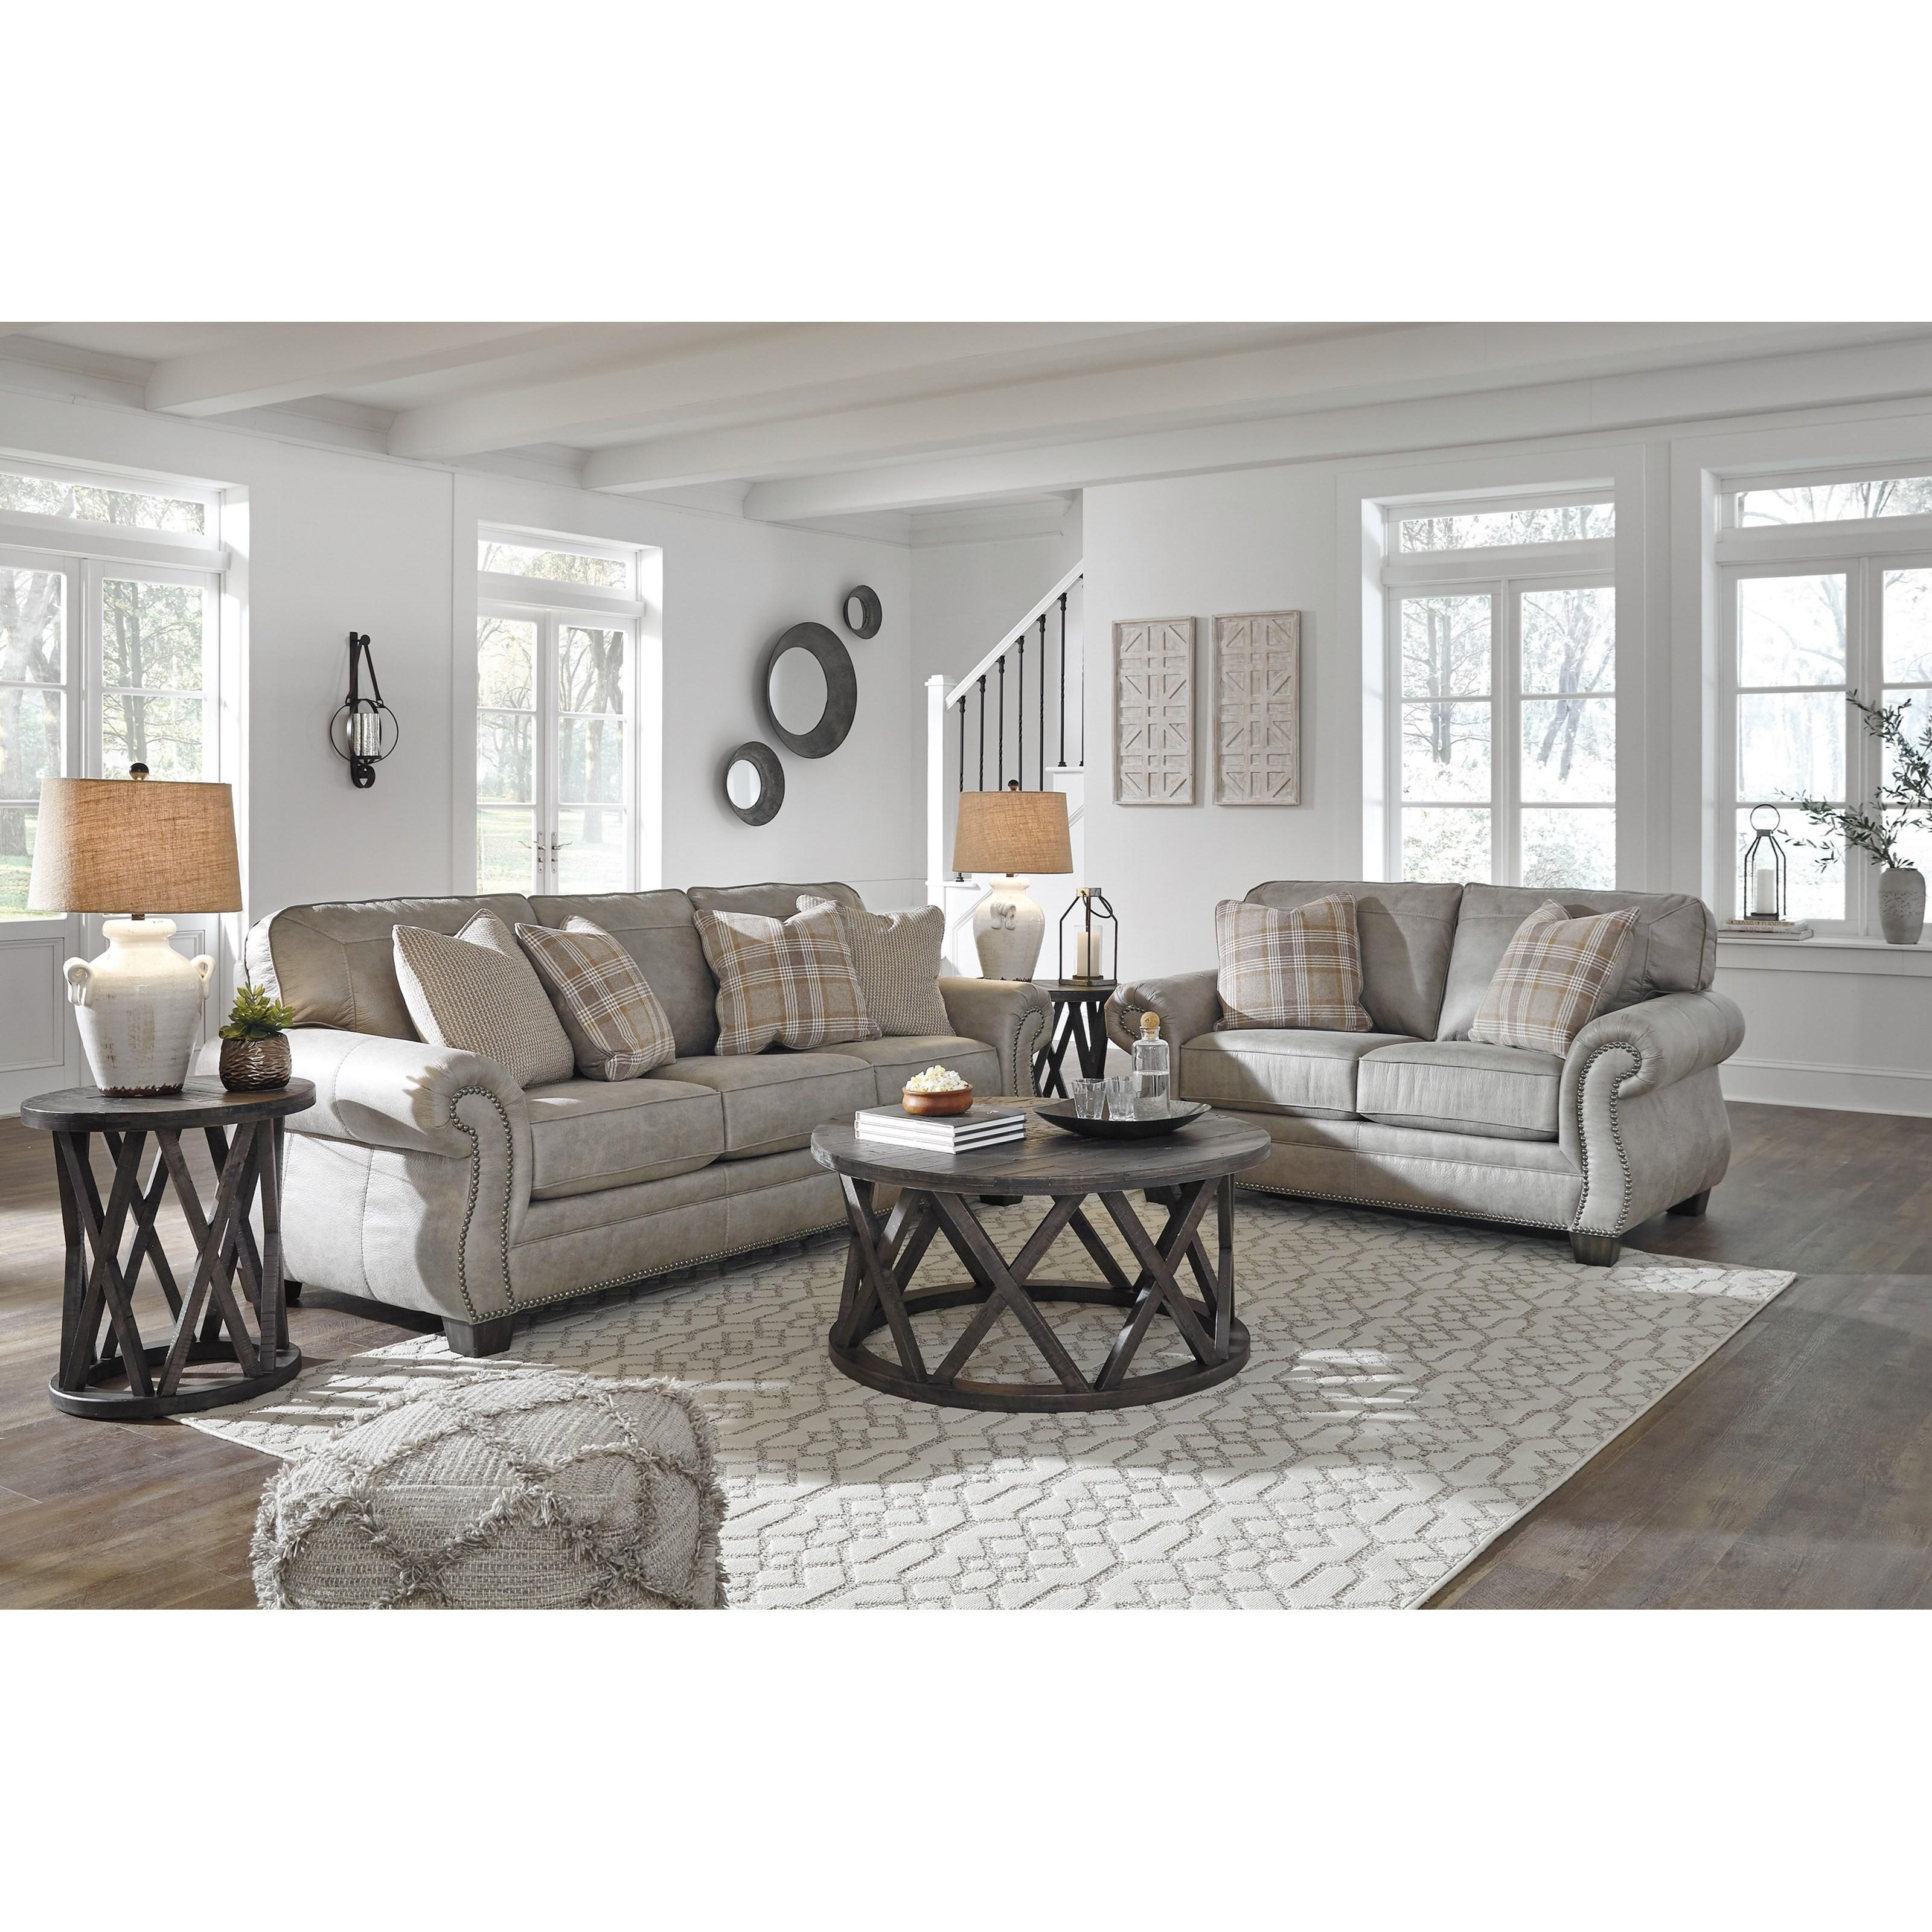 Ashley City Furniture: Signature Design By Ashley Olsberg Stationary Living Room